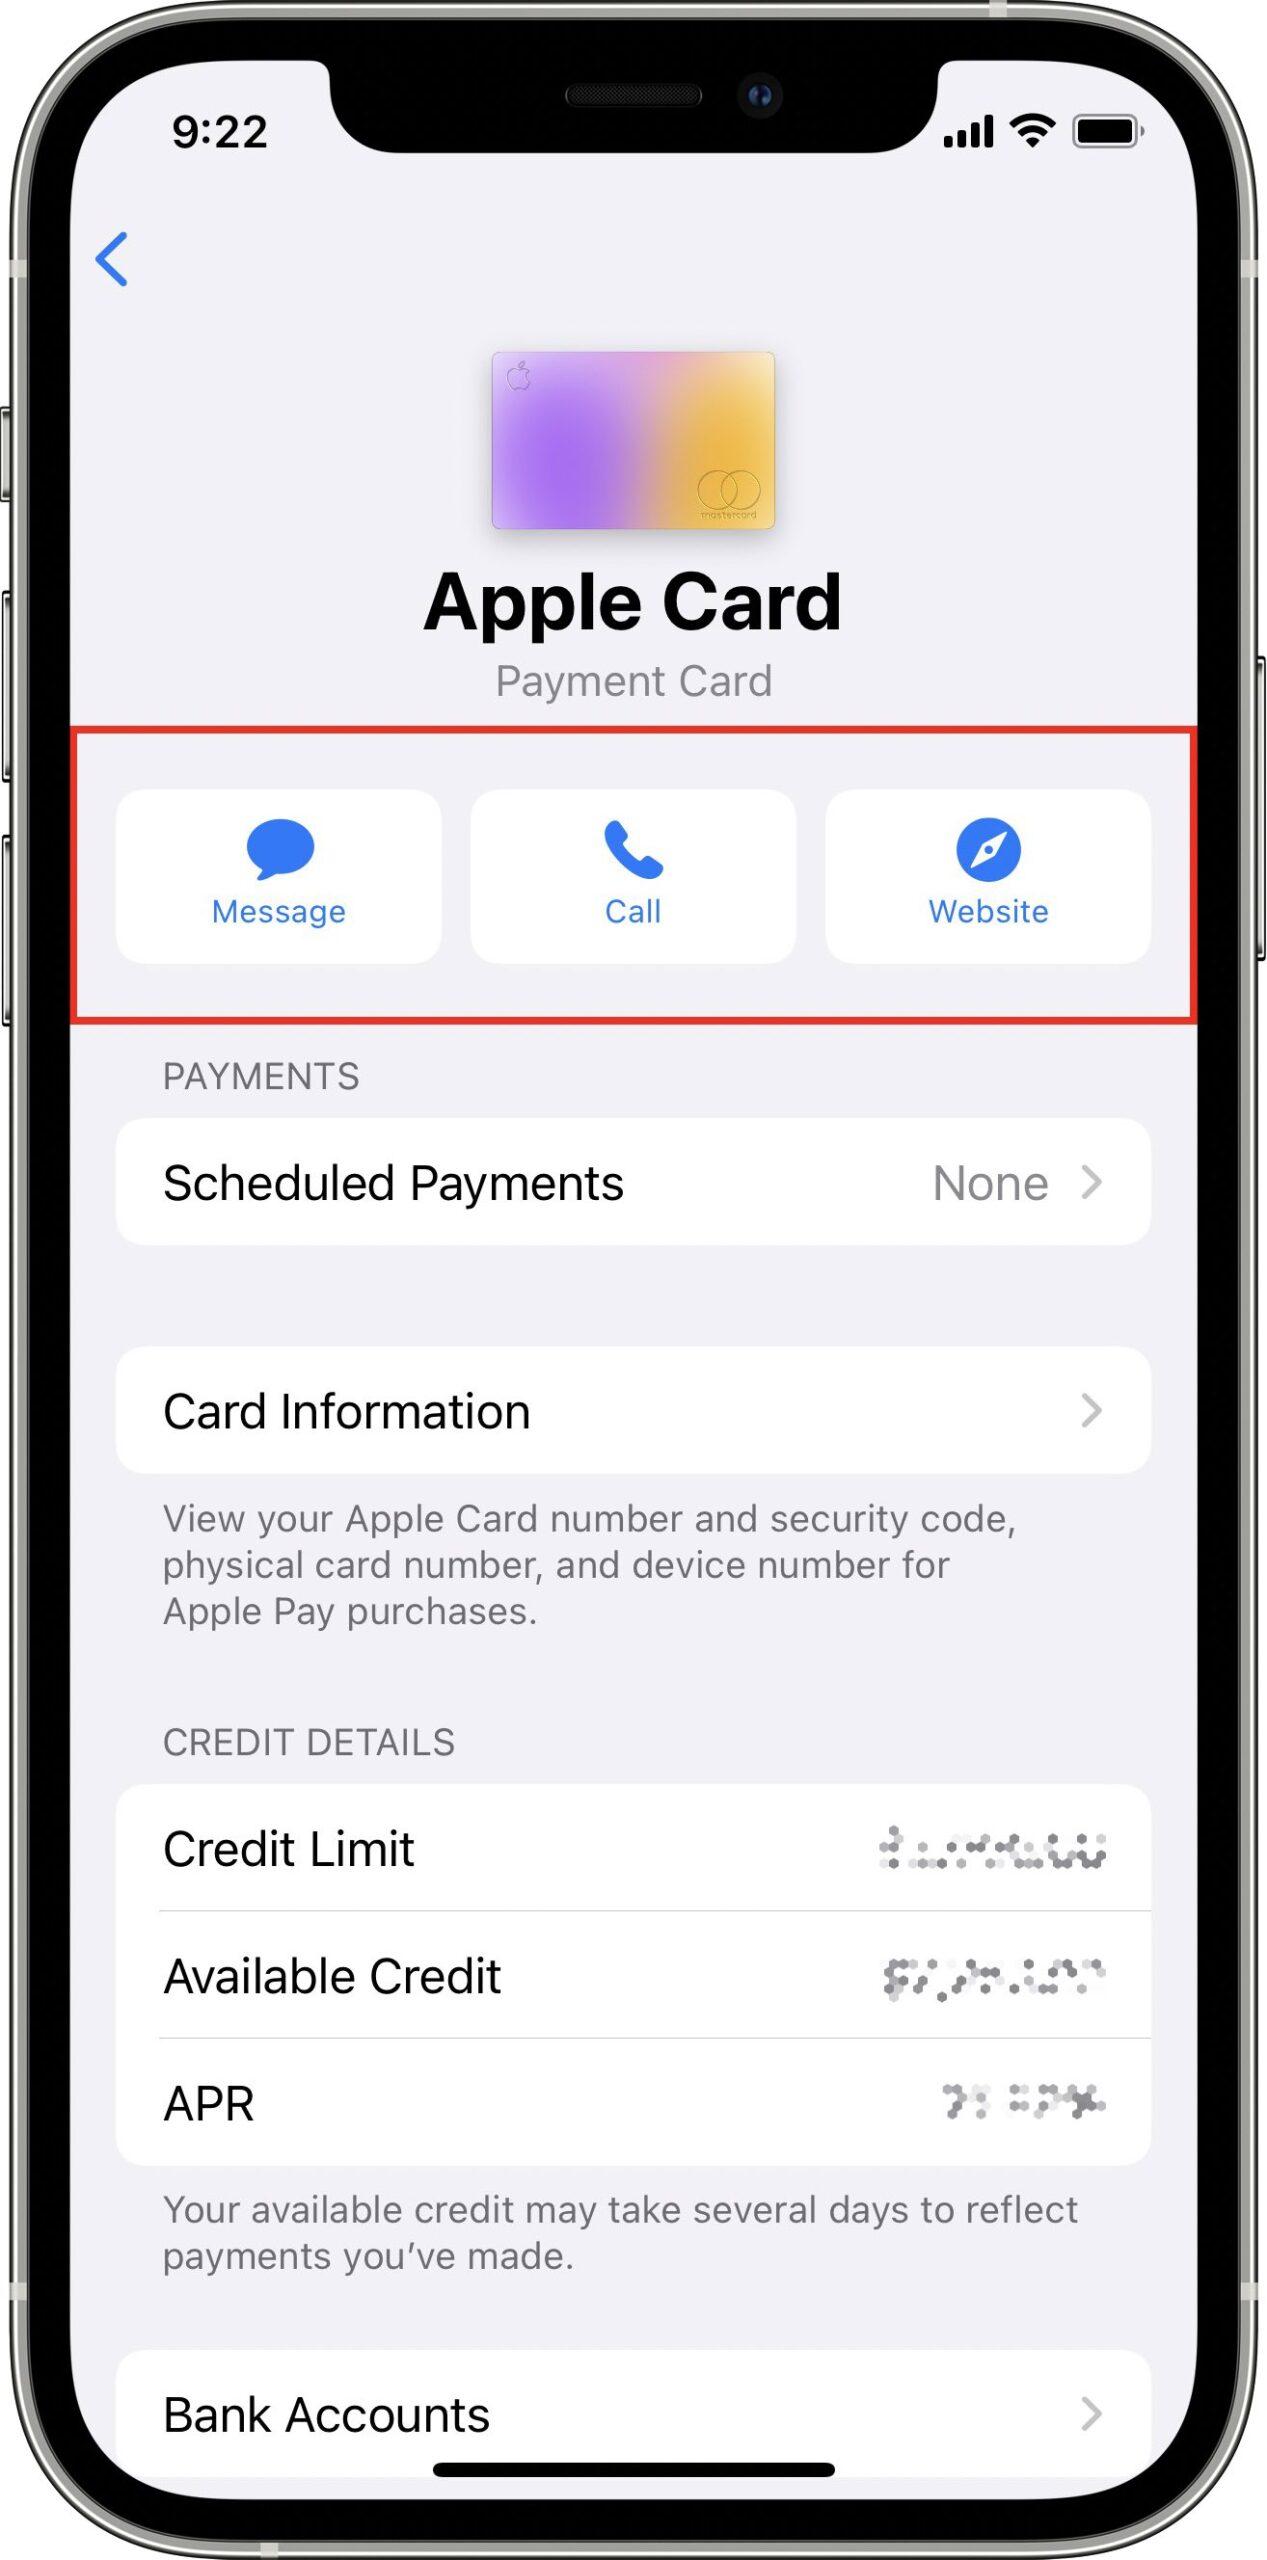 Apple Card customer support